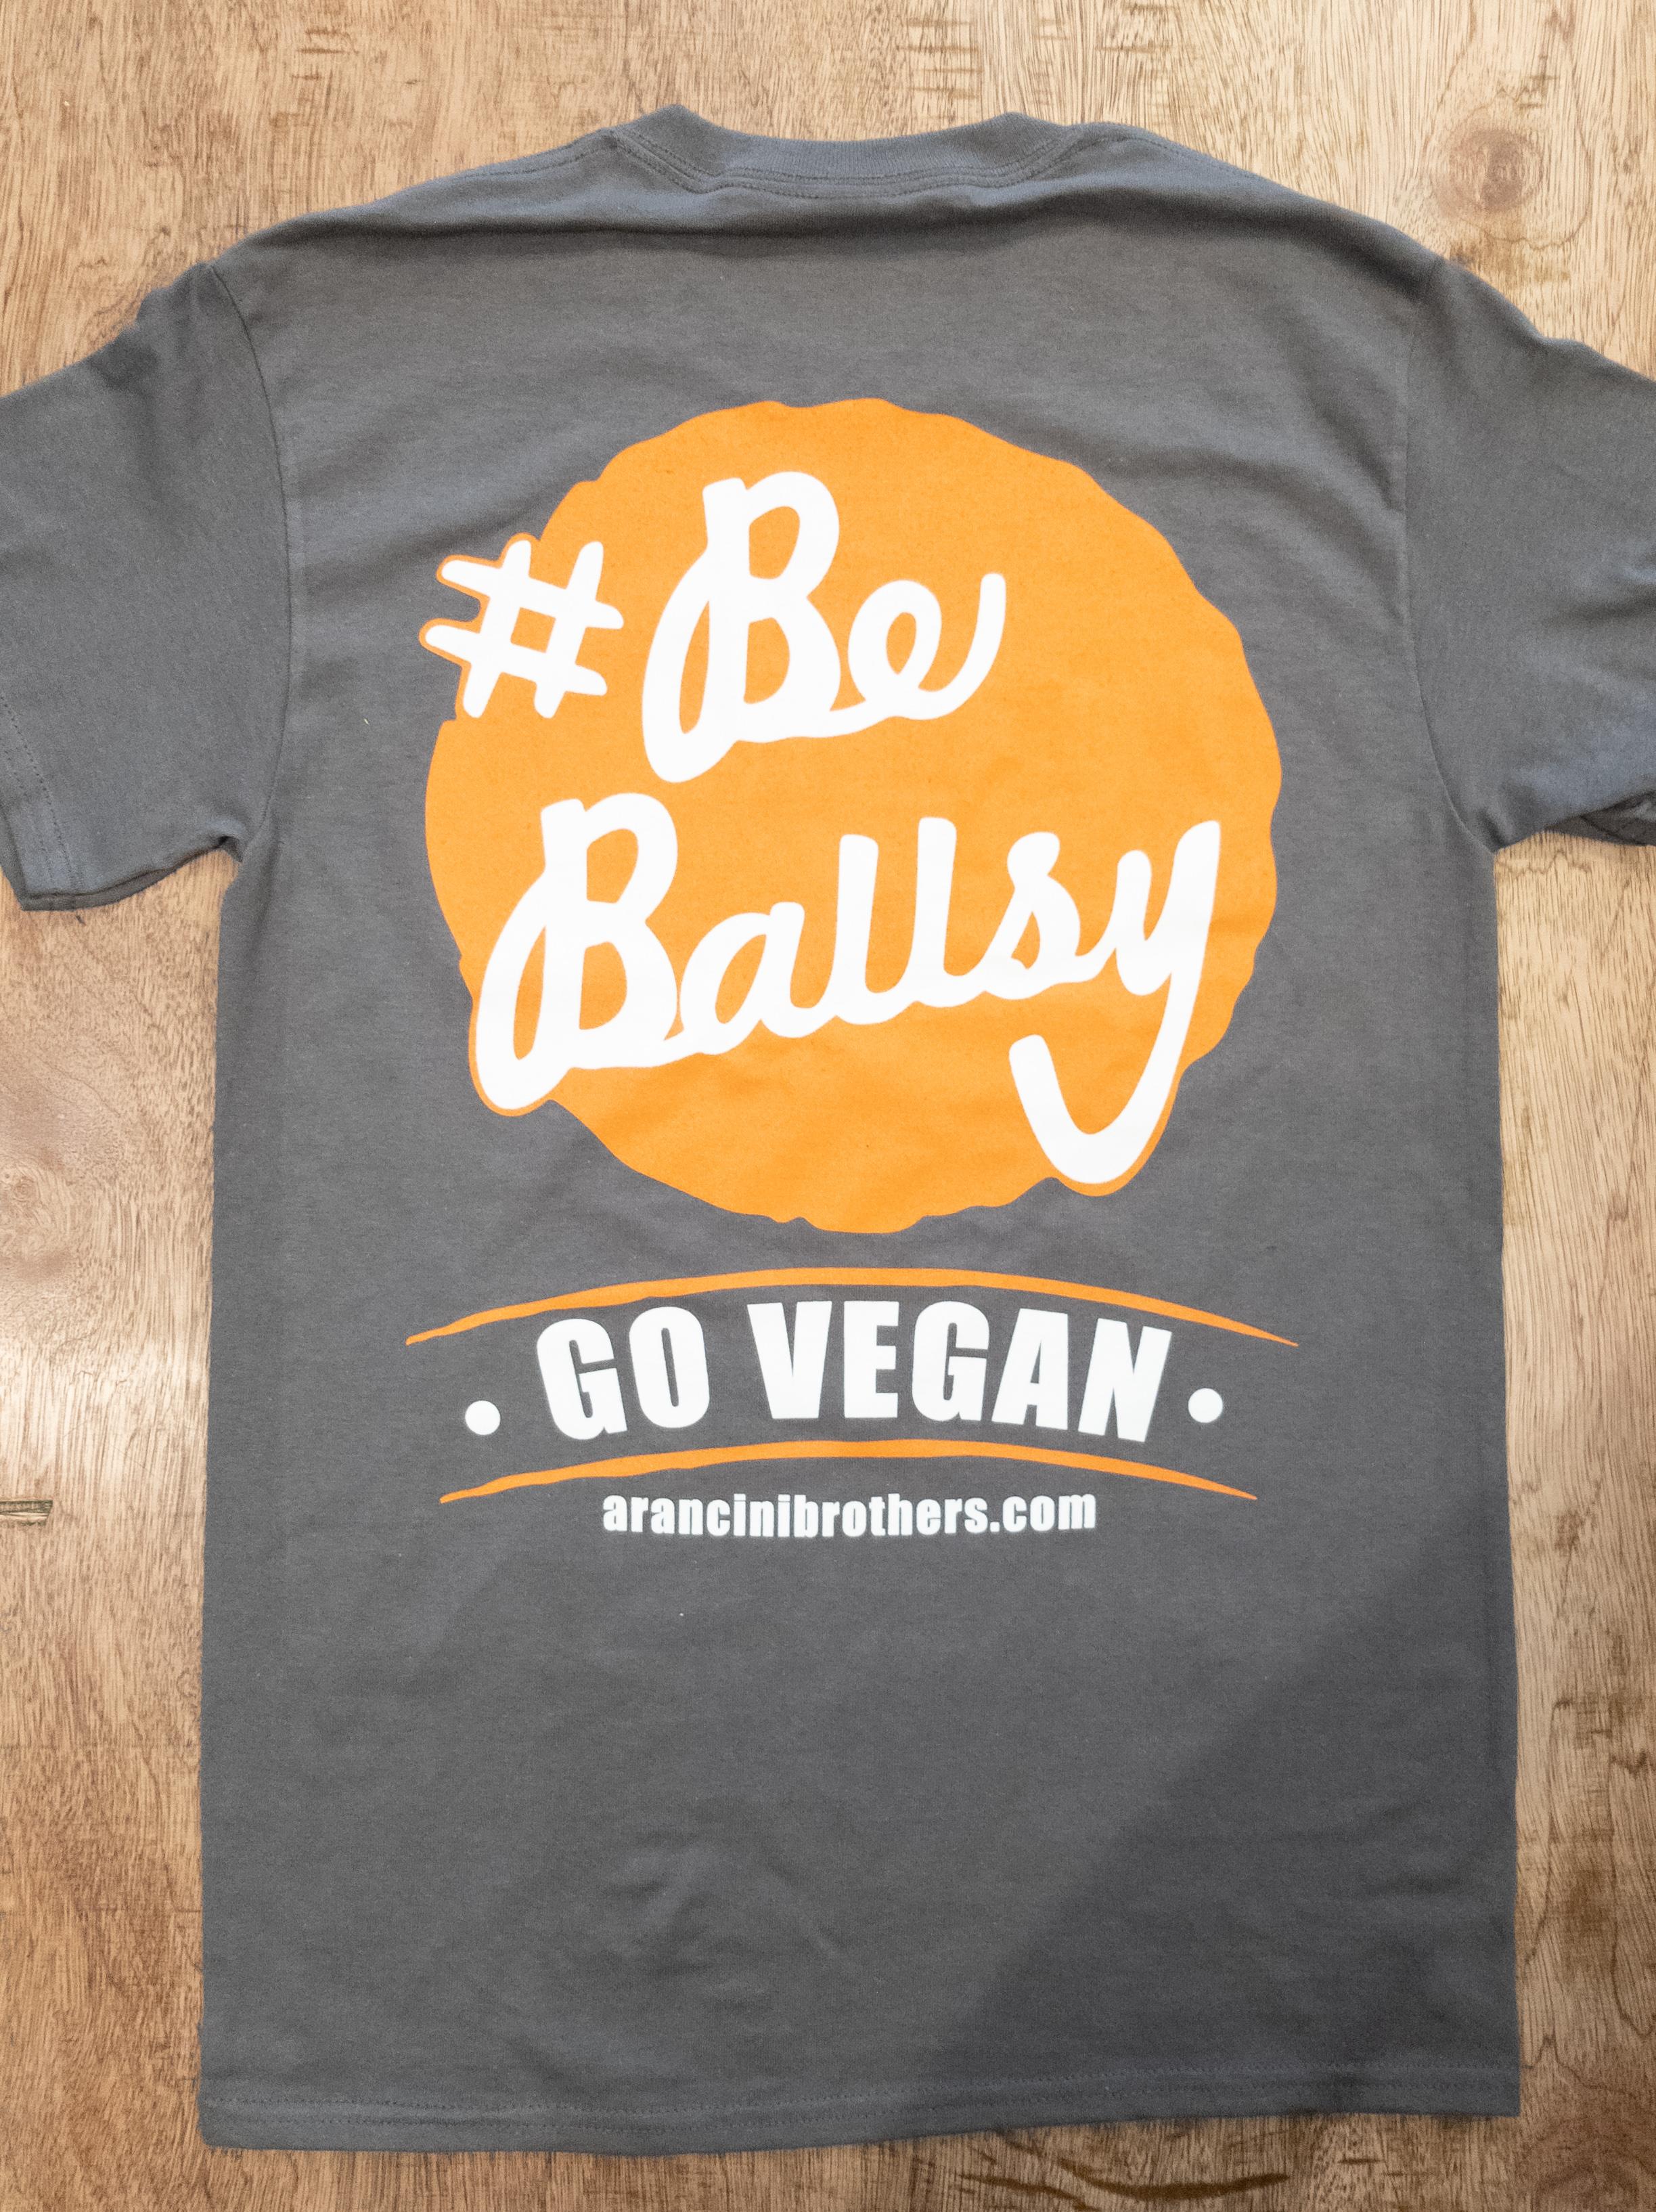 BeBallsy T-Shirt